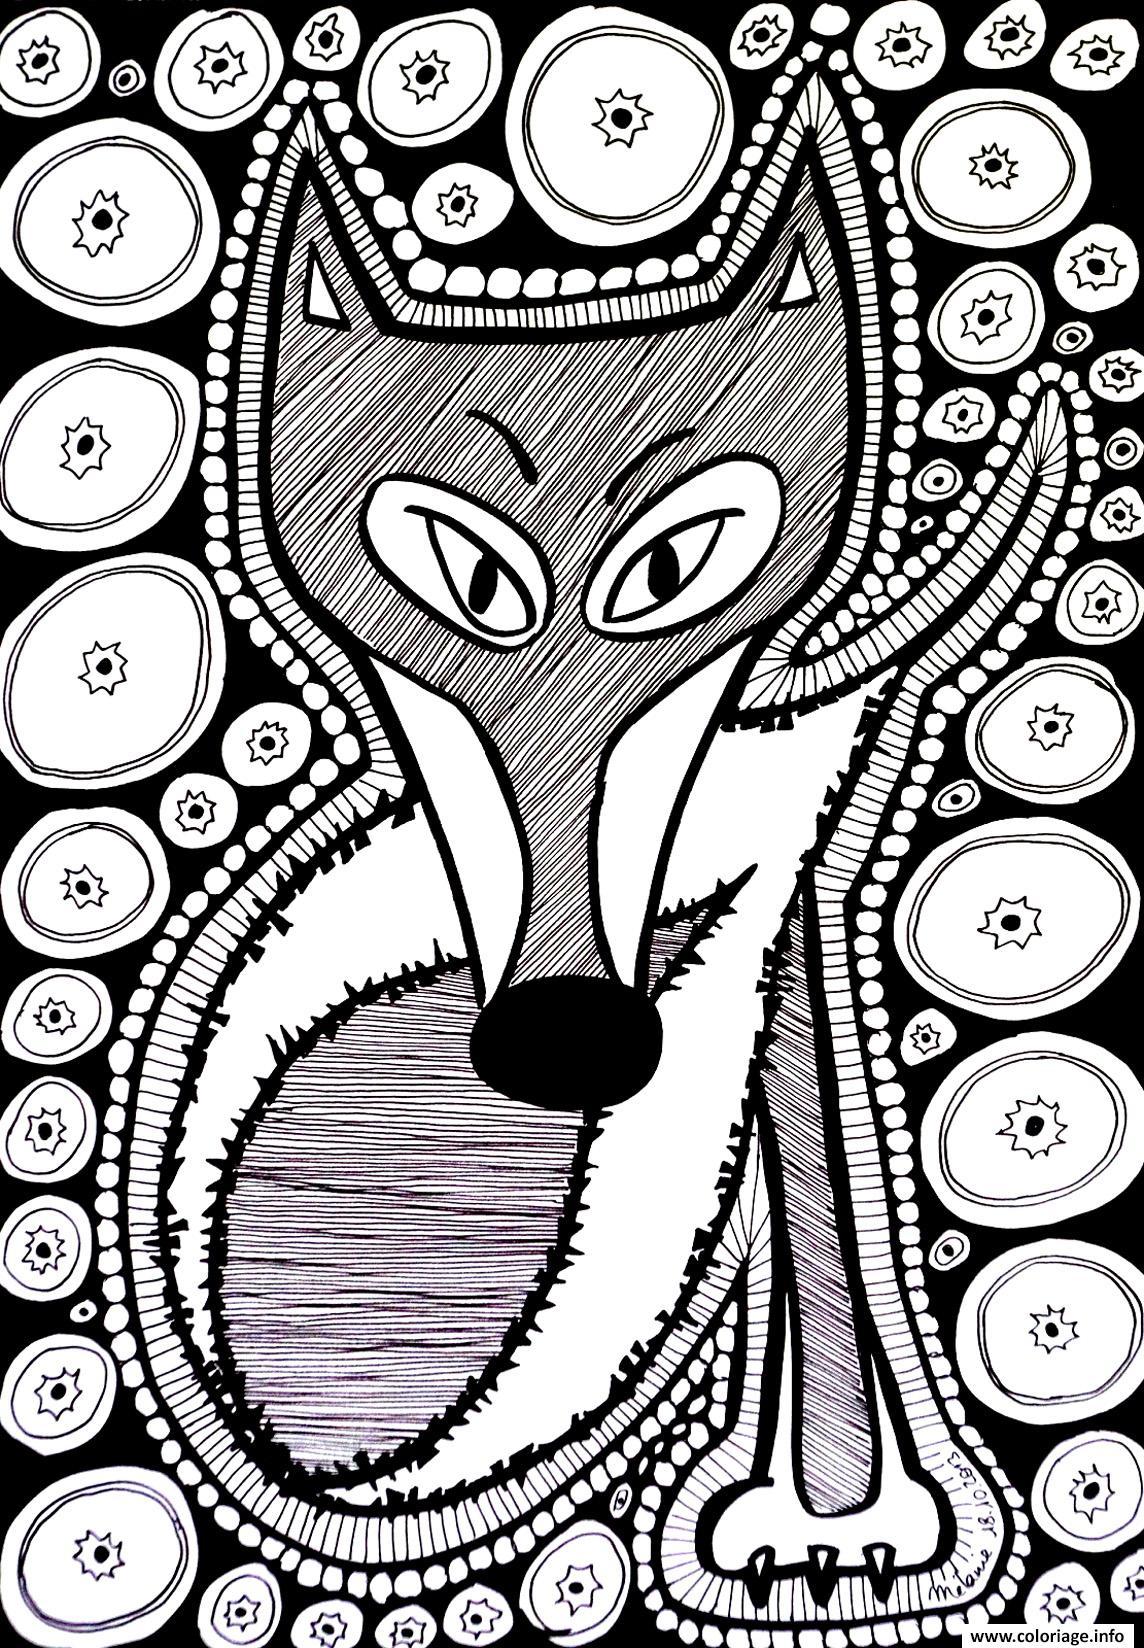 Coloriage difficile renard dessin - Coloriage renard a imprimer ...